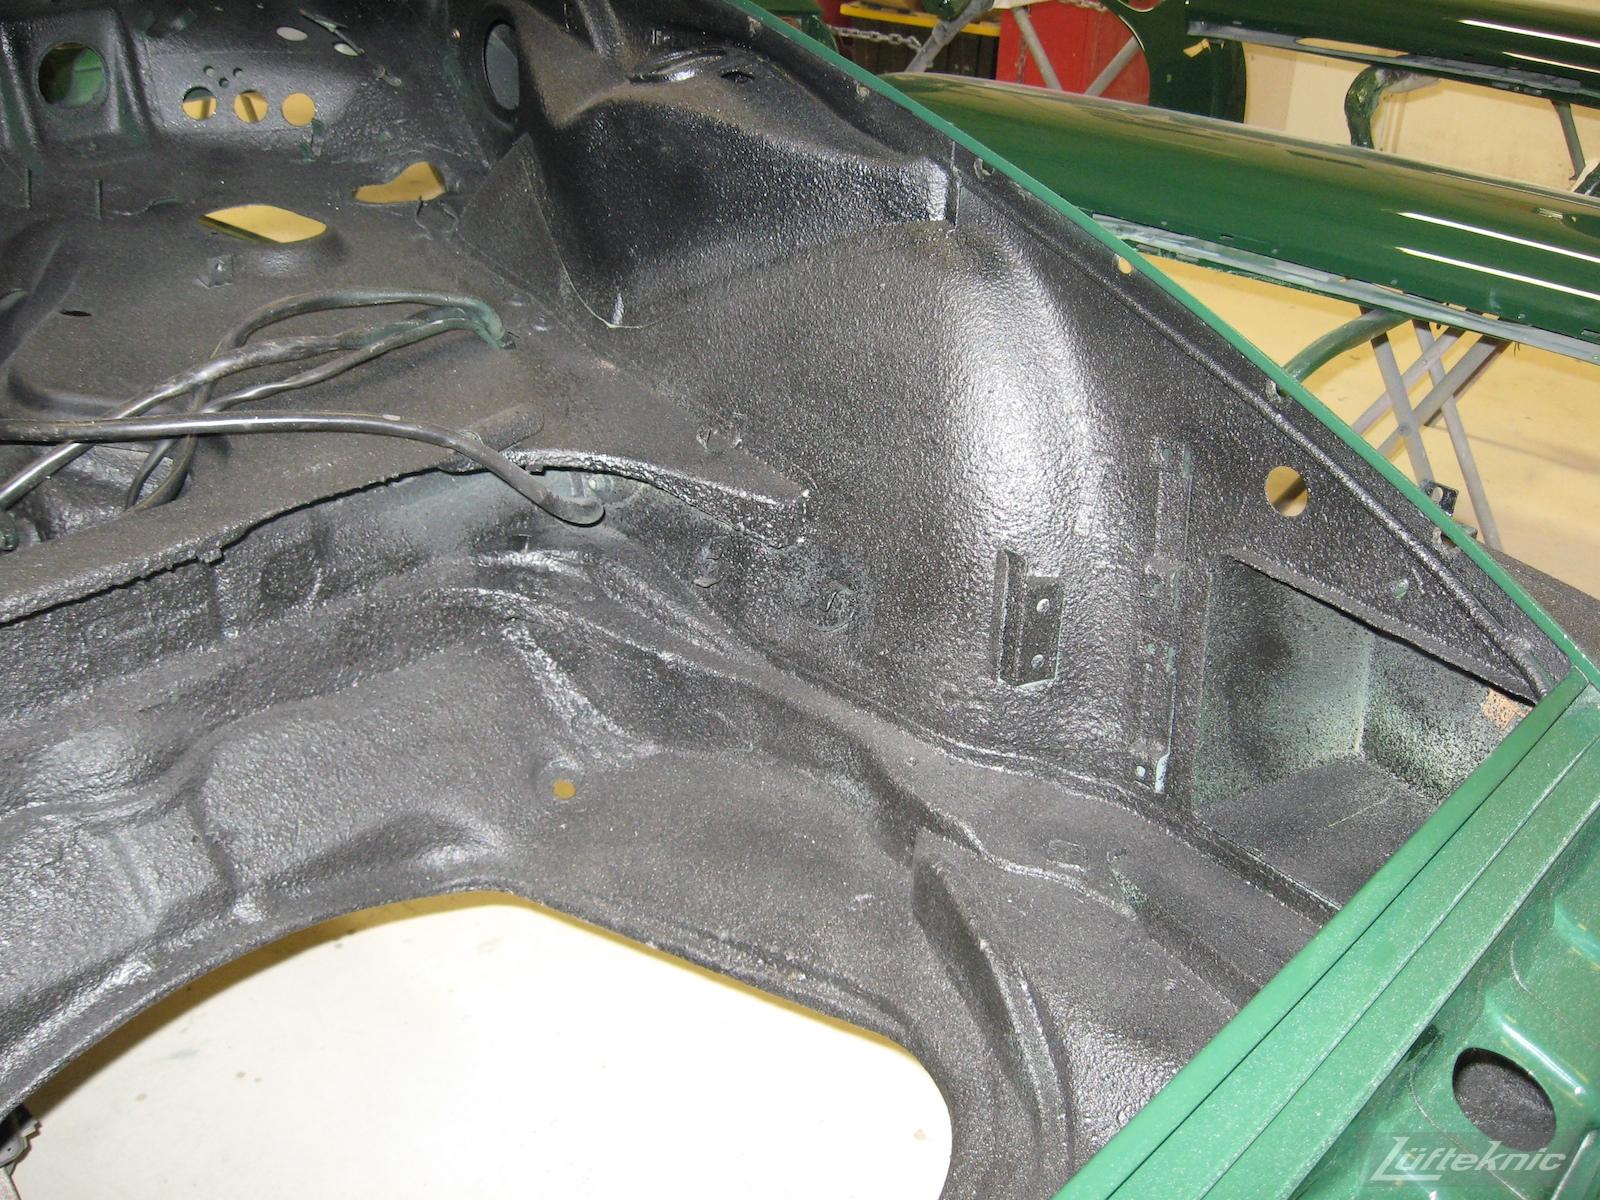 Front body pan repair after paint and undercoat of an Irish Green Porsche 912 undergoing restoration at Lufteknic.